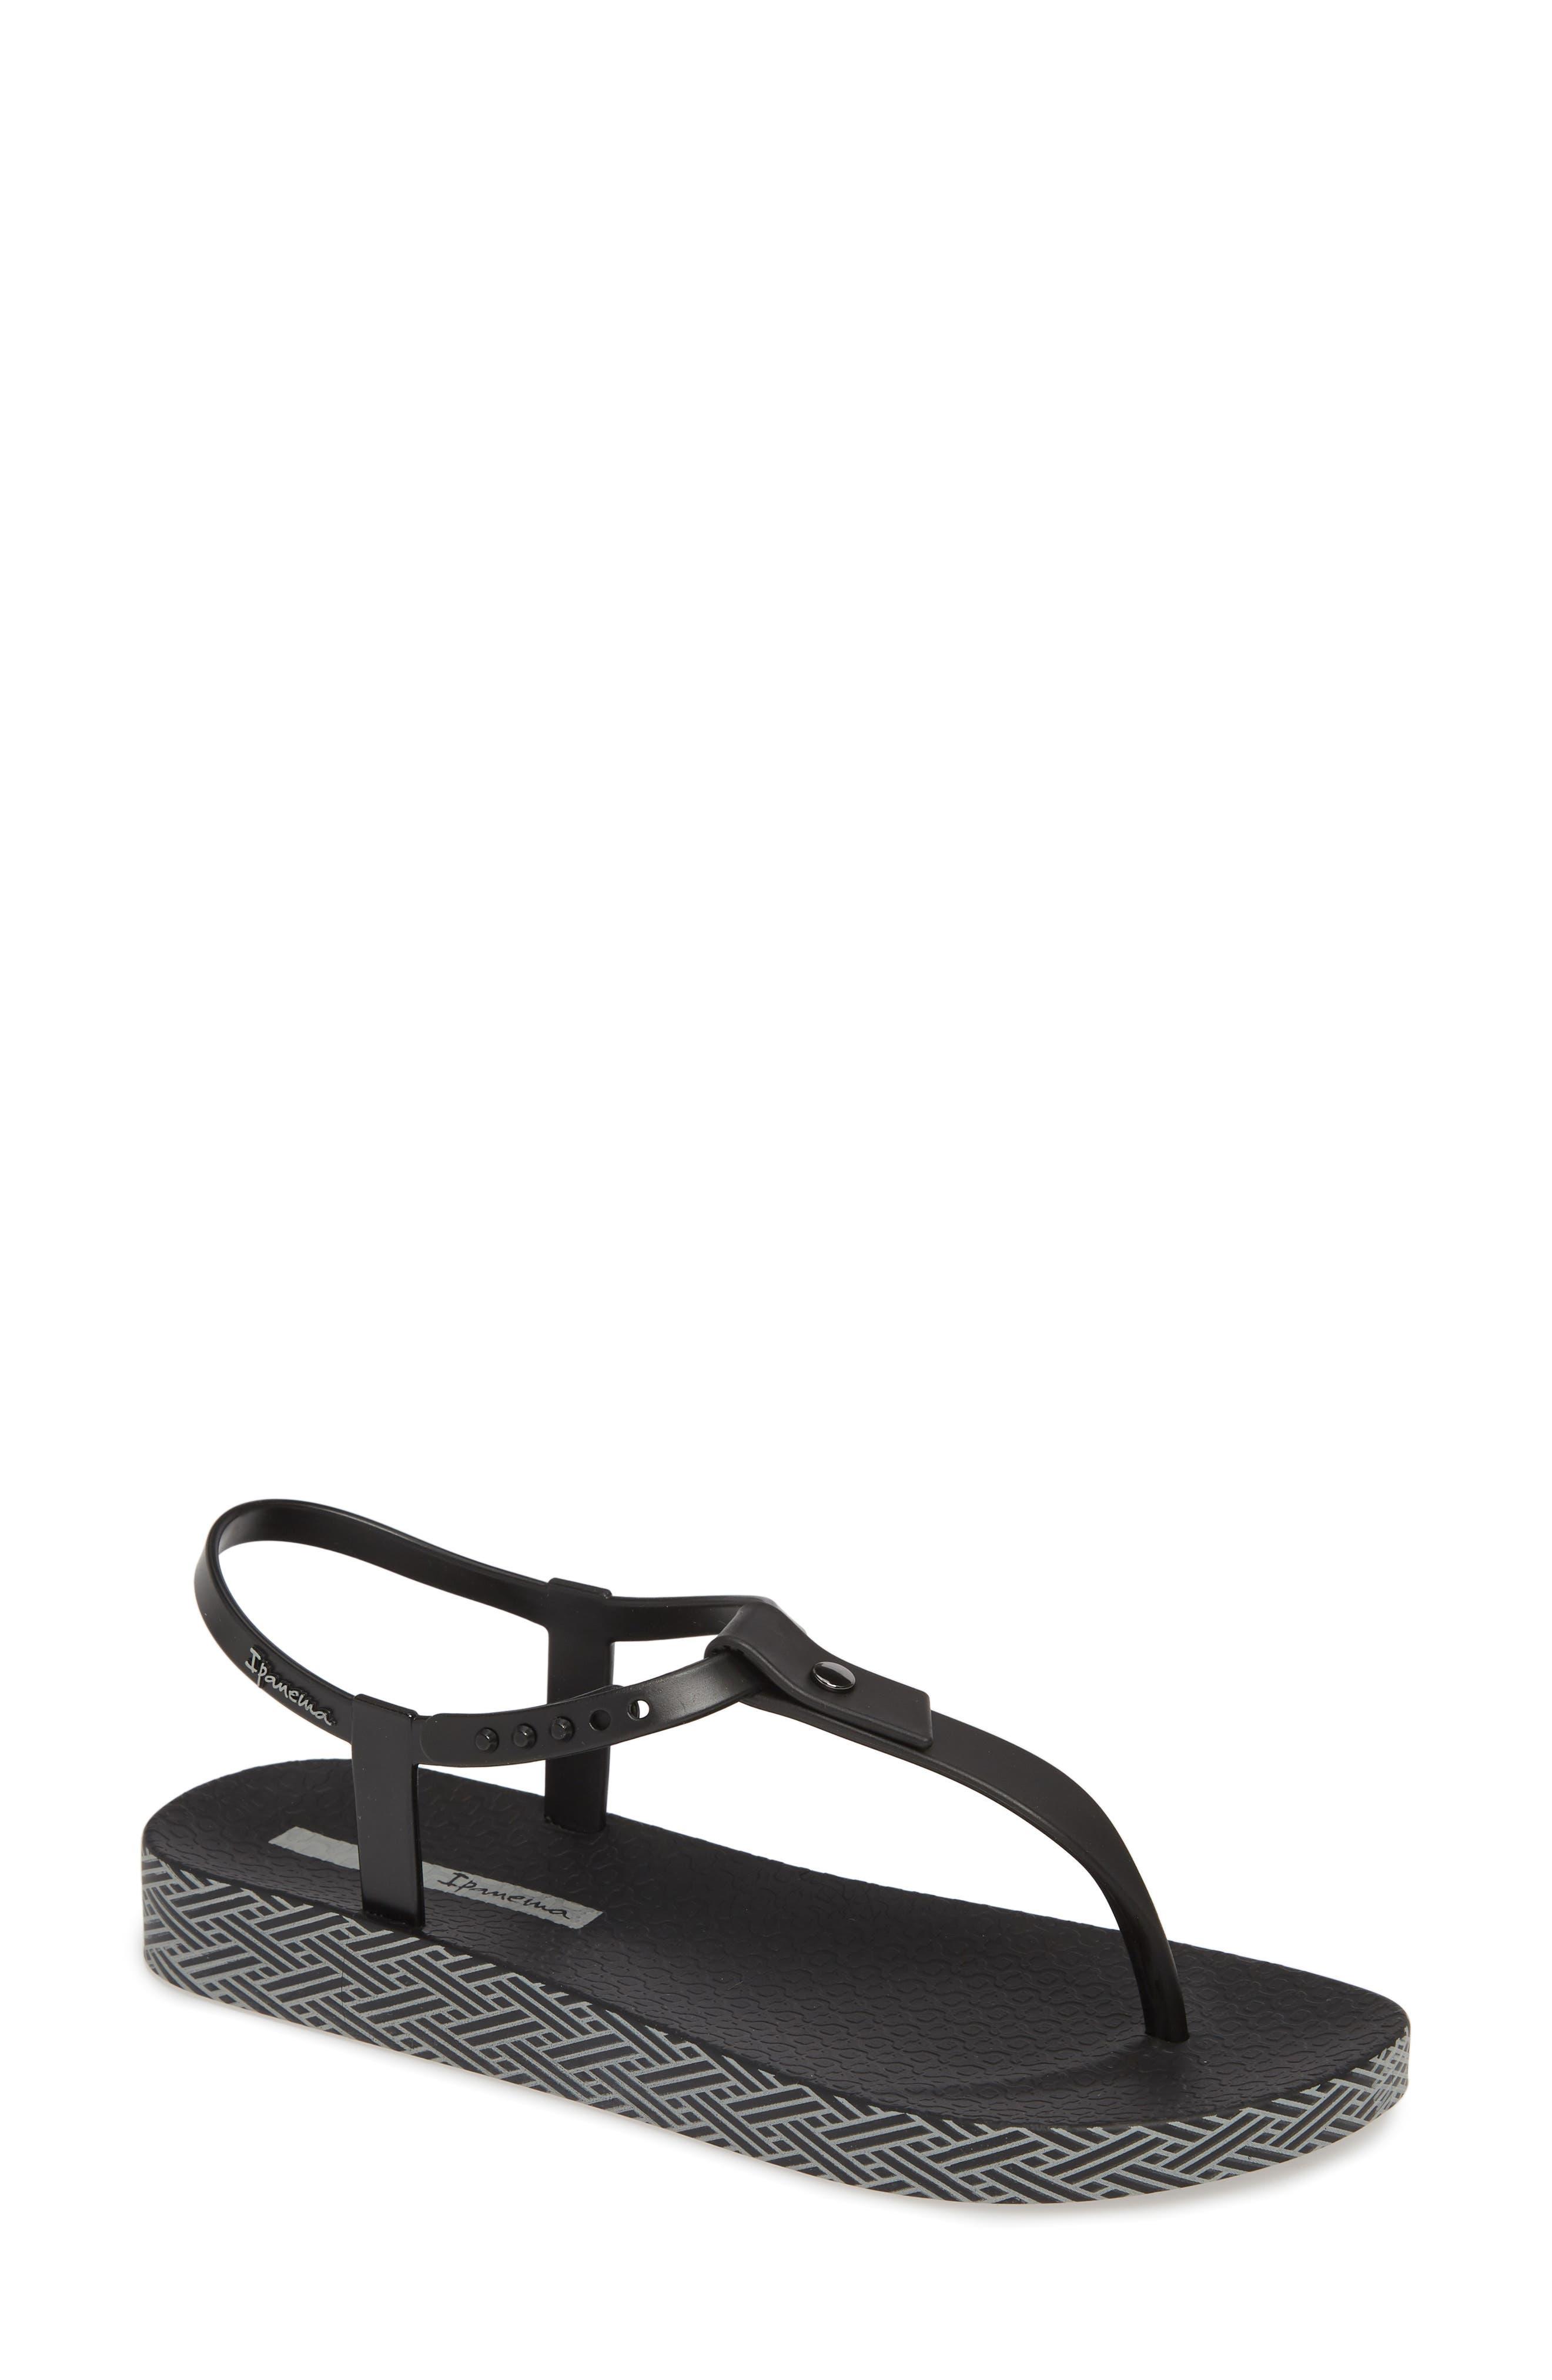 IPANEMA Plush Weave T-Strap Sandal, Main, color, BLACK